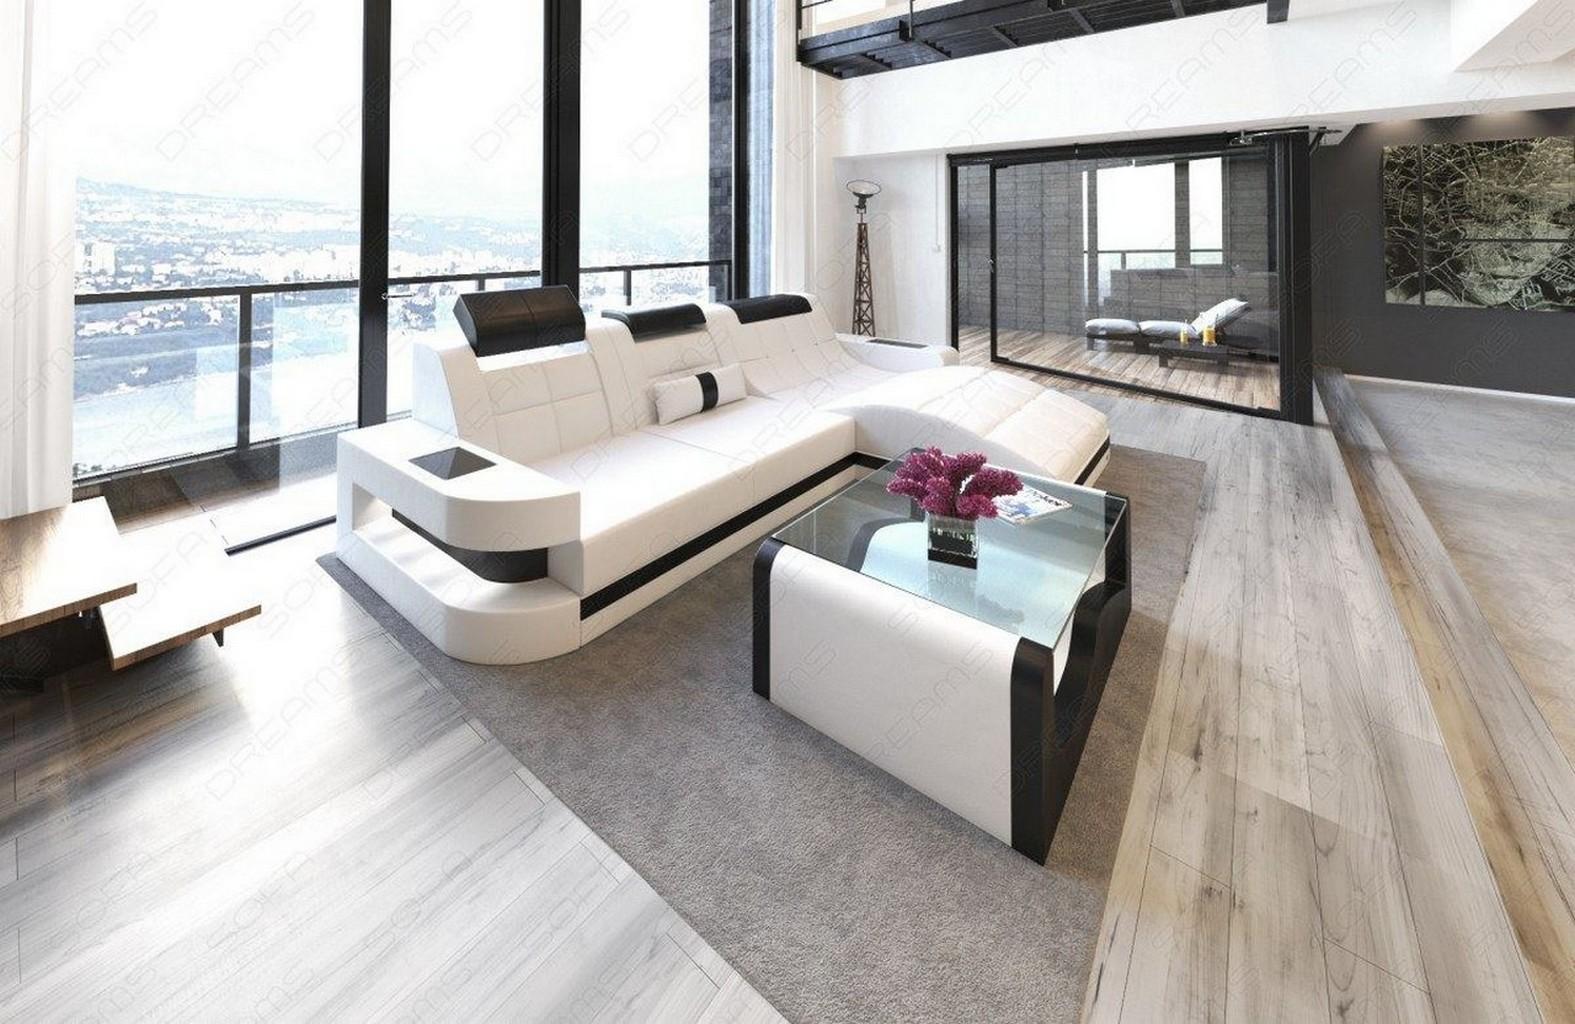 Ledersofa WAVE LForm LED Luxus Design Sofa Eckcouch